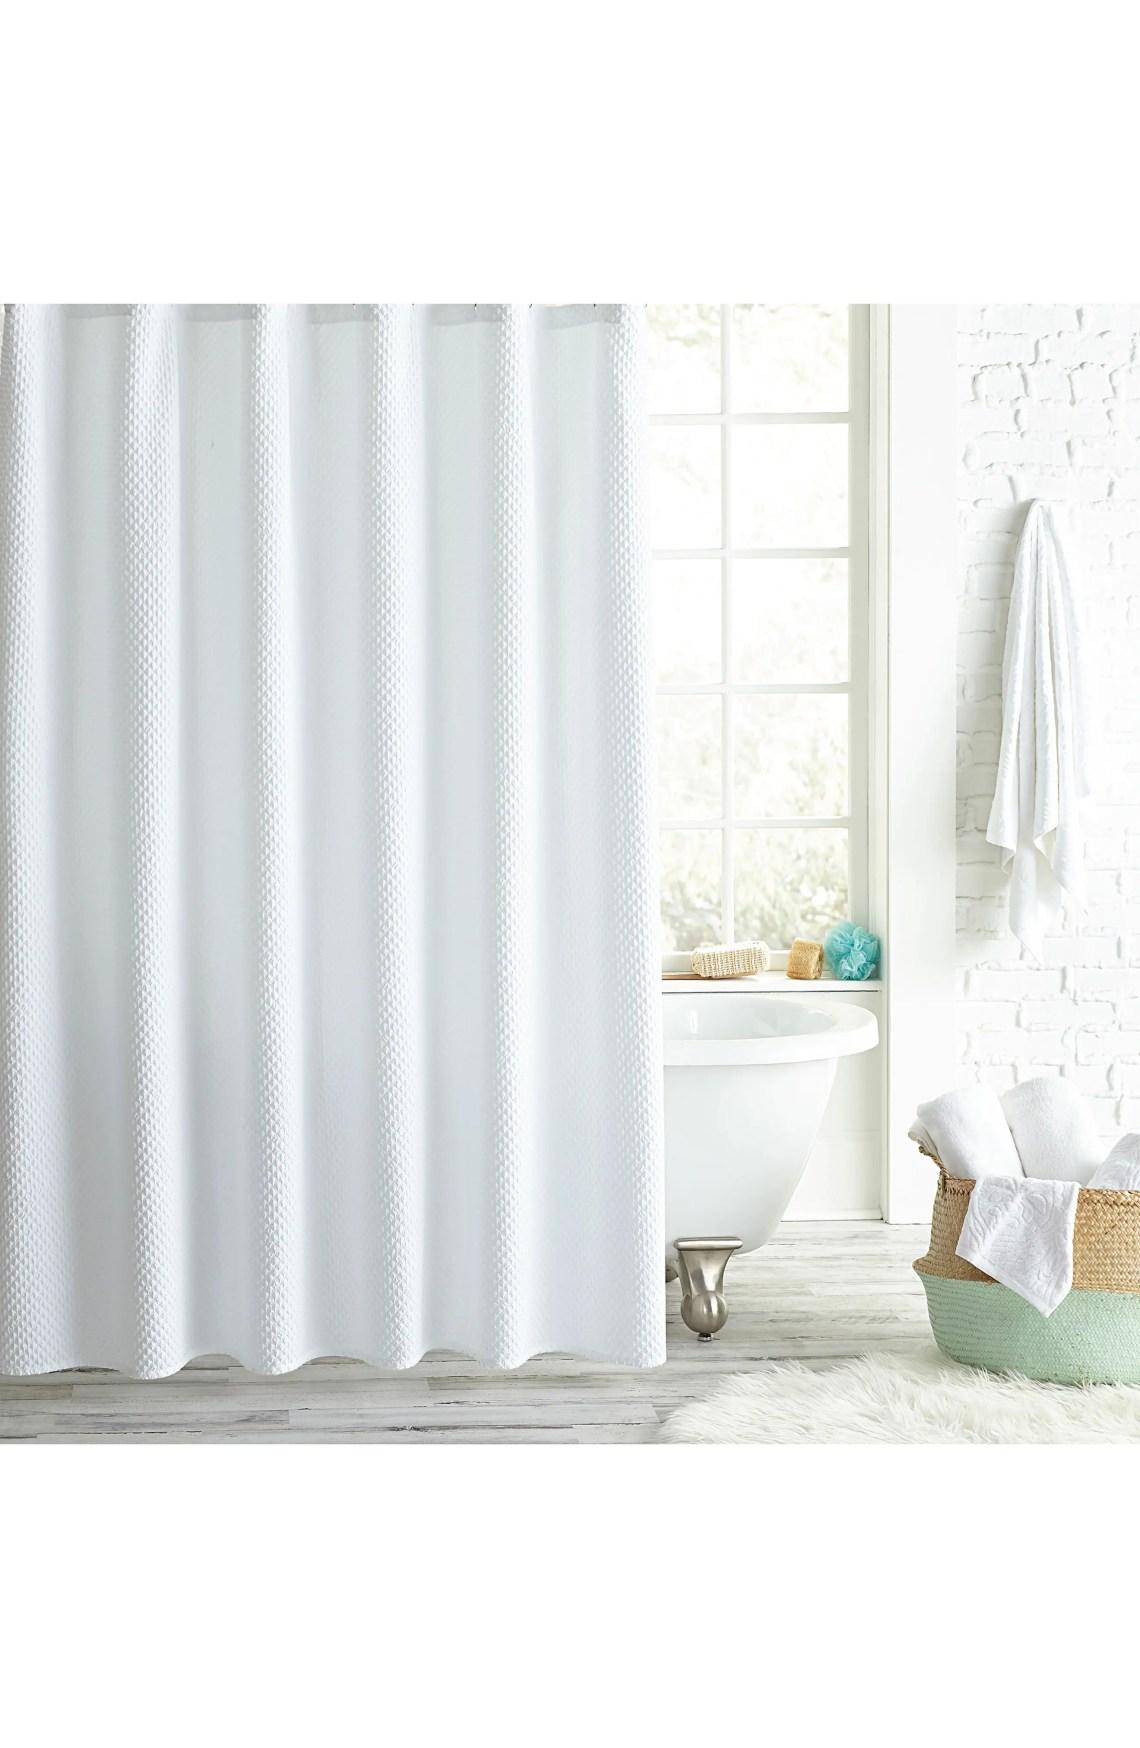 Peri Home Pebble Microsculpt Shower Curtain